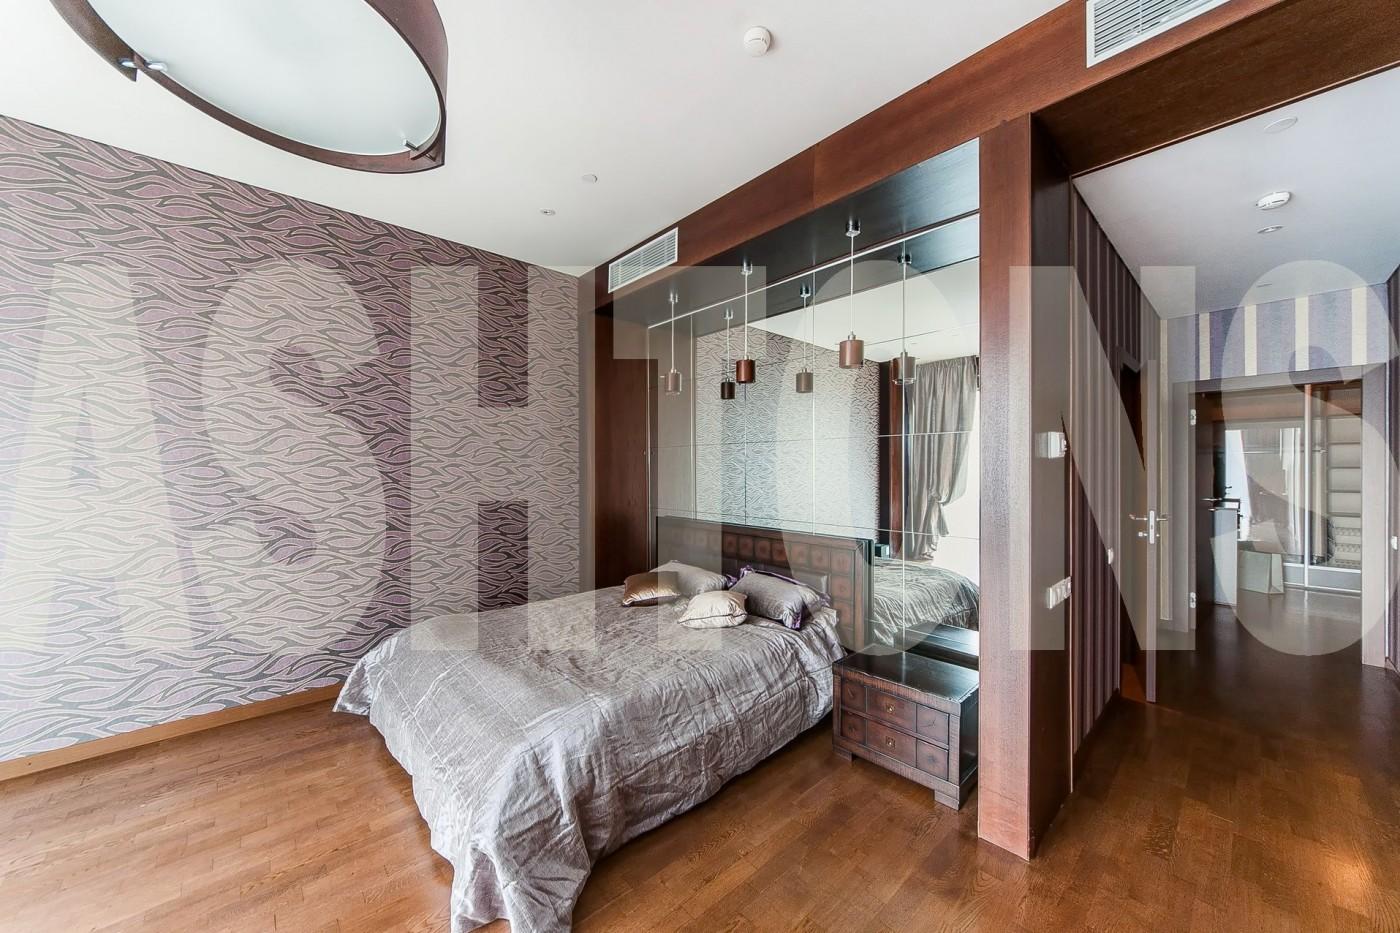 Apartment for rent in Residential Complex Gorod Stolits on Presnenskaya embankment, building 8 by ASHTONS INTERNATIONAL REALTY